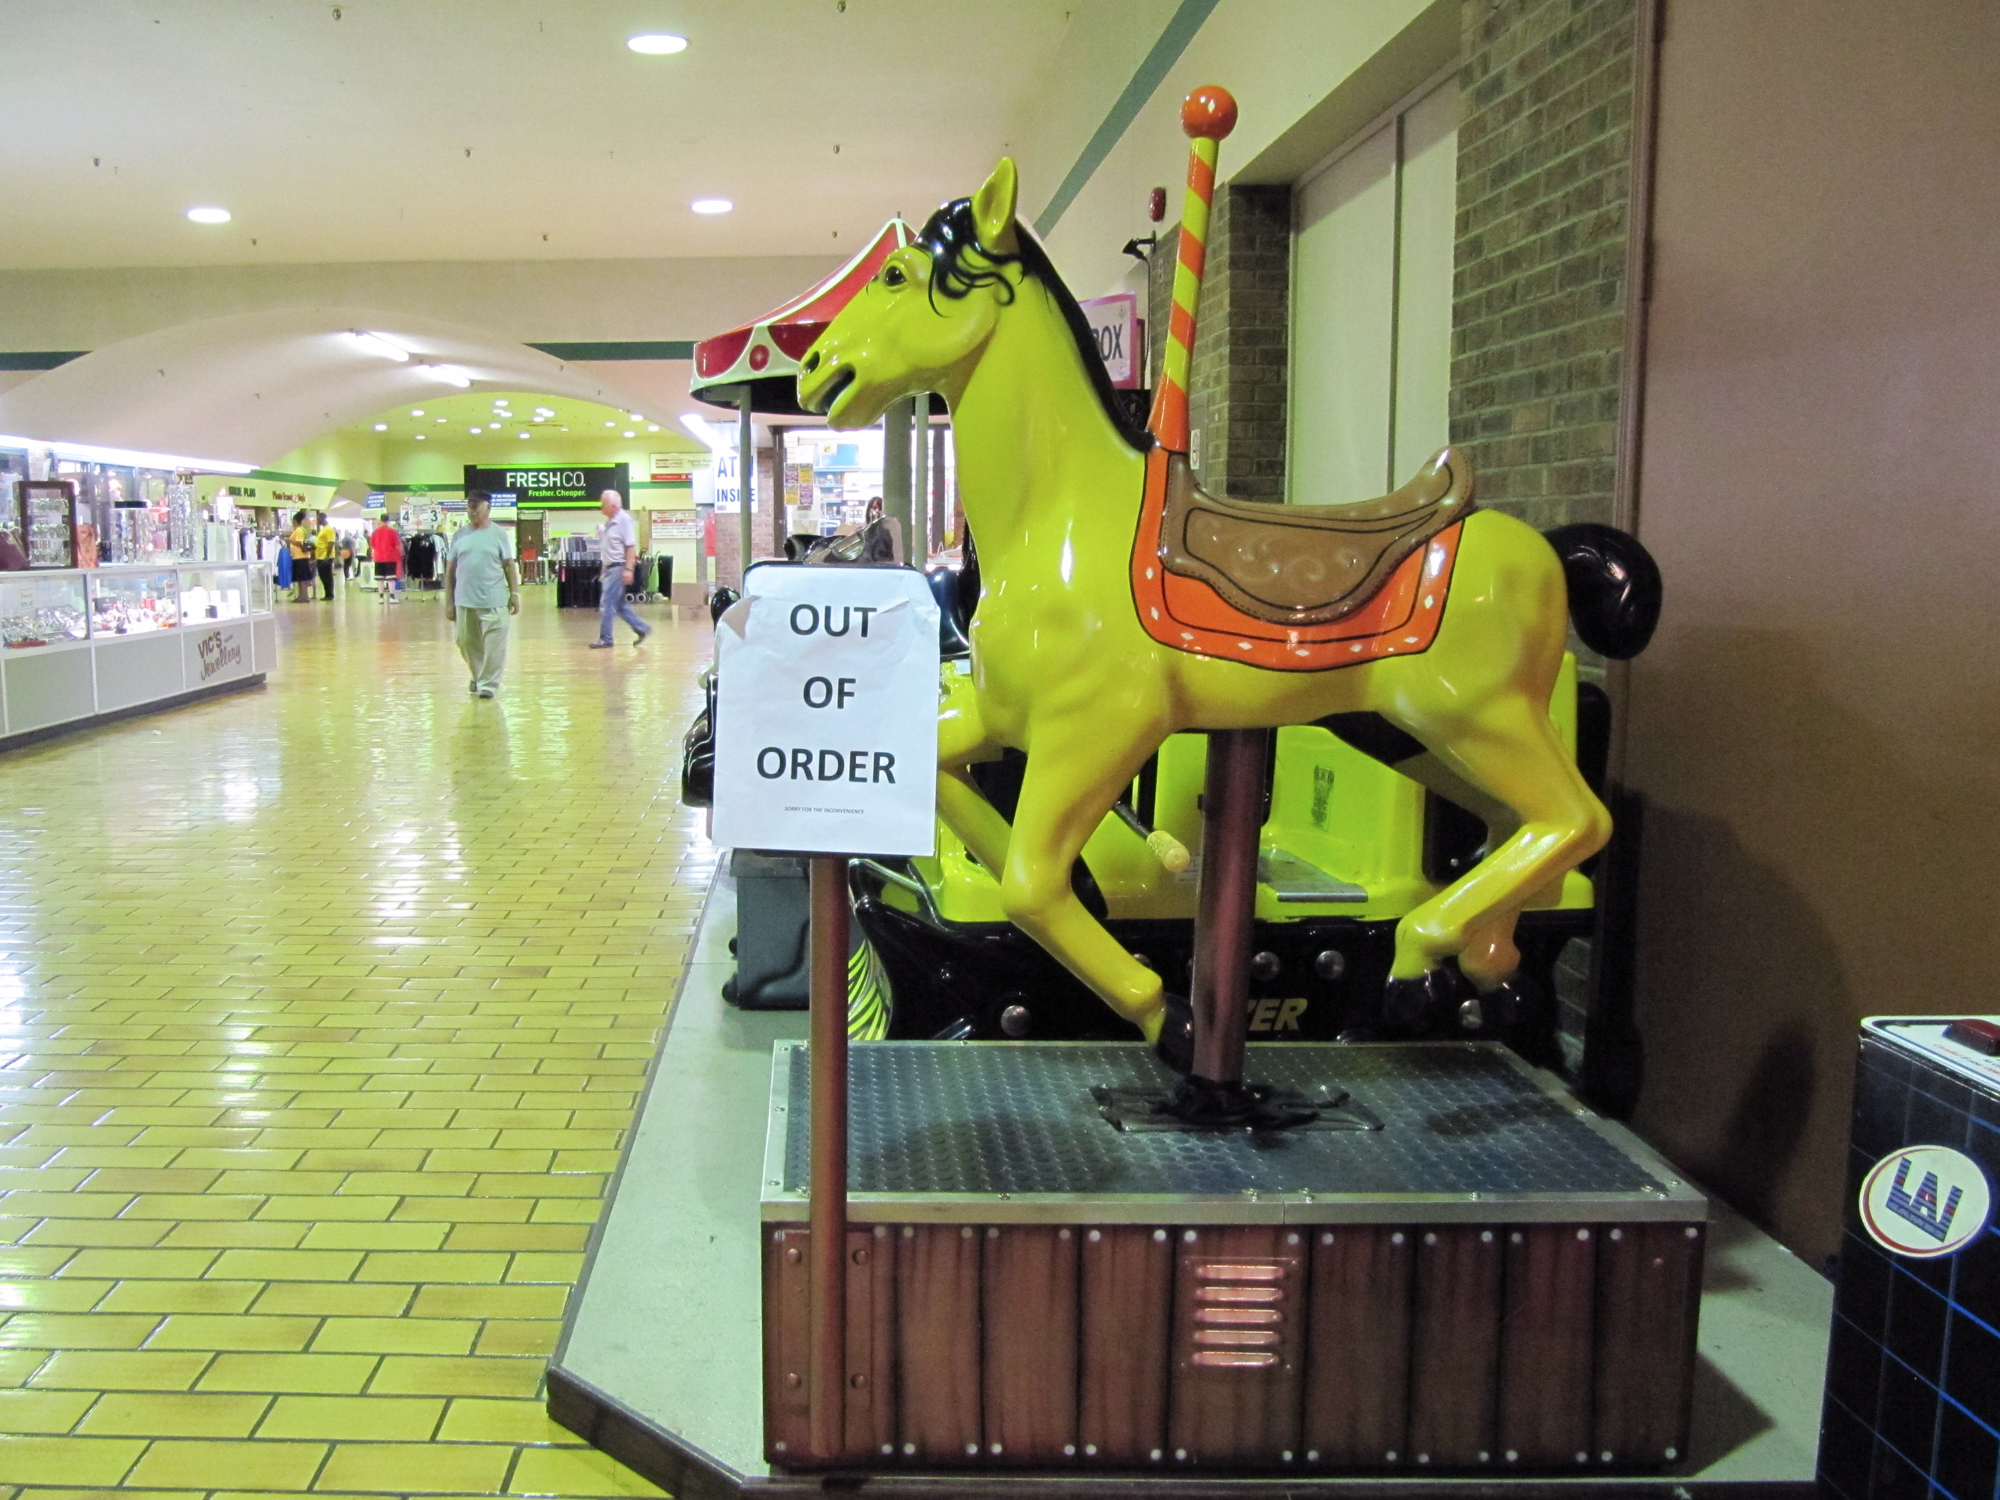 Shari Kasman, Out of Order Horse, 2013